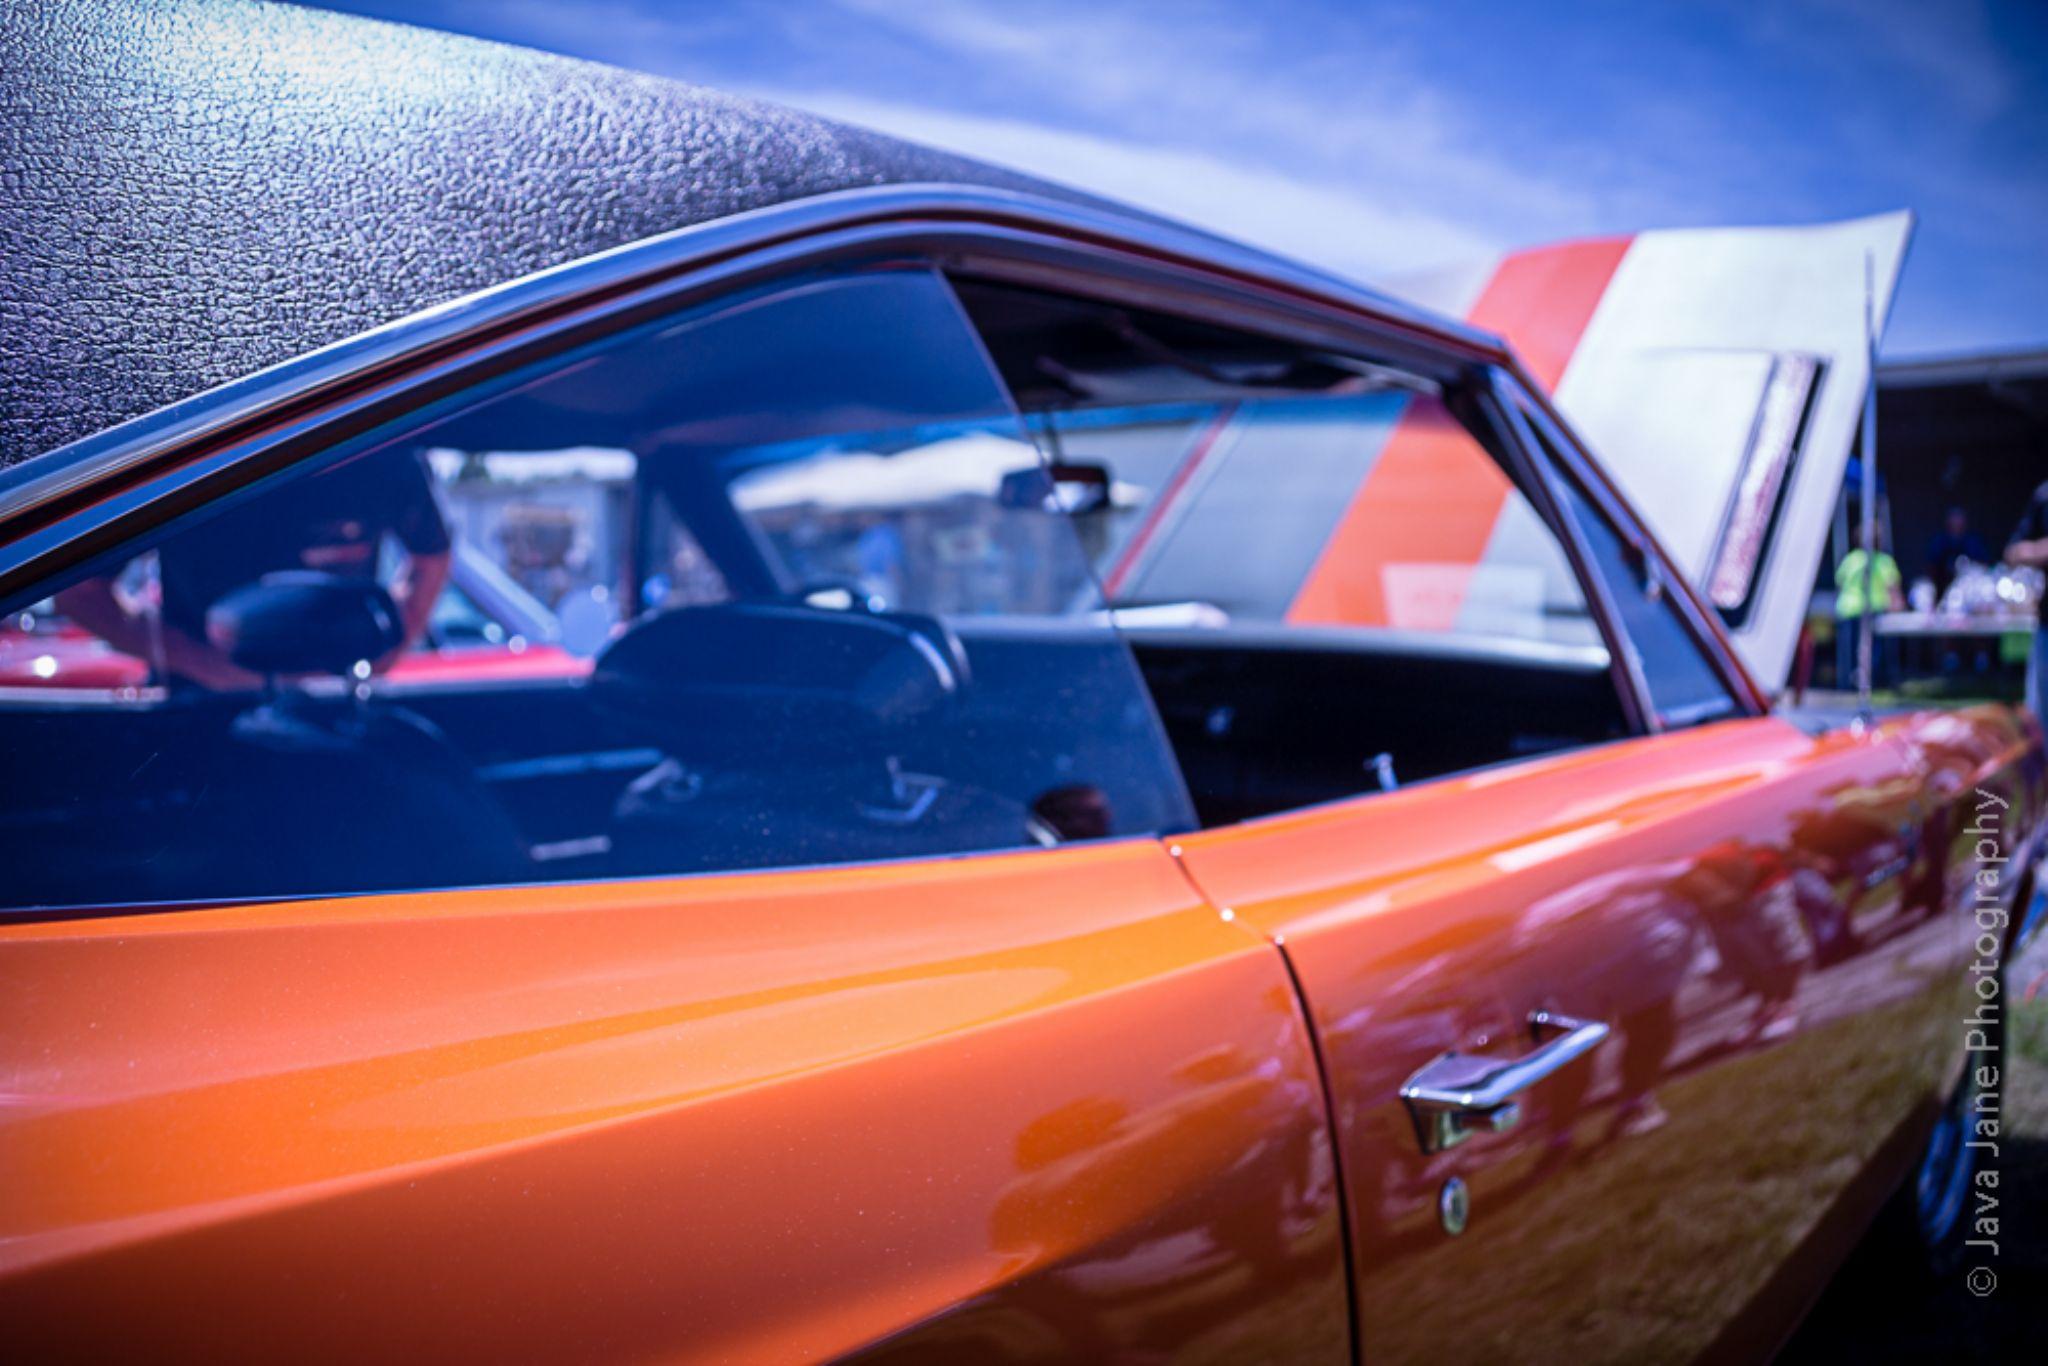 Blue and Orange by Tony Harris